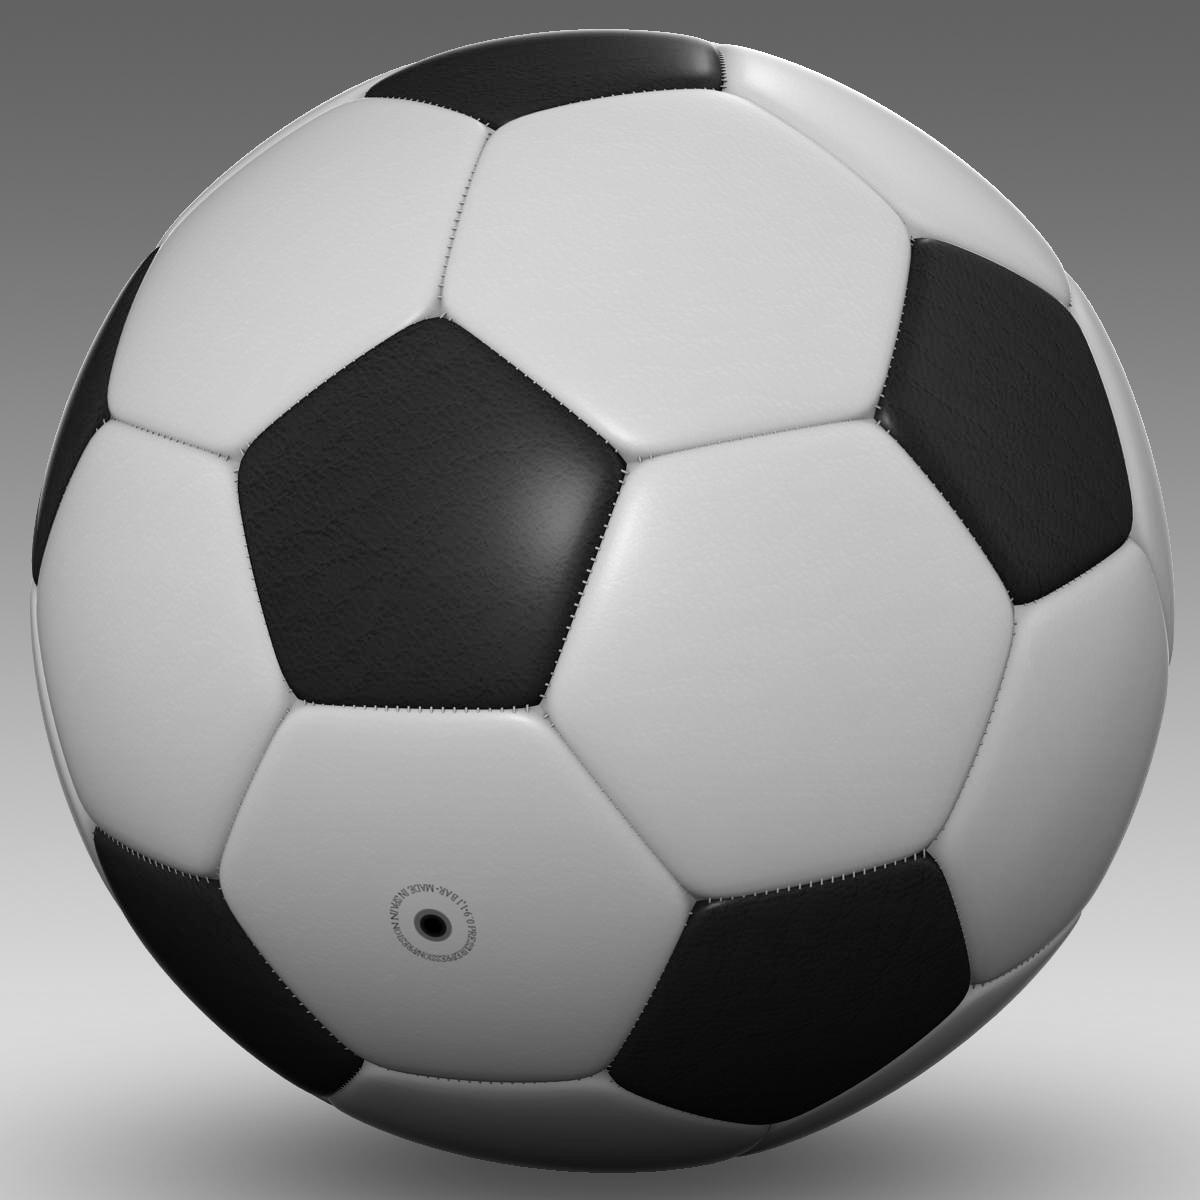 soccerball black white 3d model 3ds max fbx c4d ma mb obj 203954